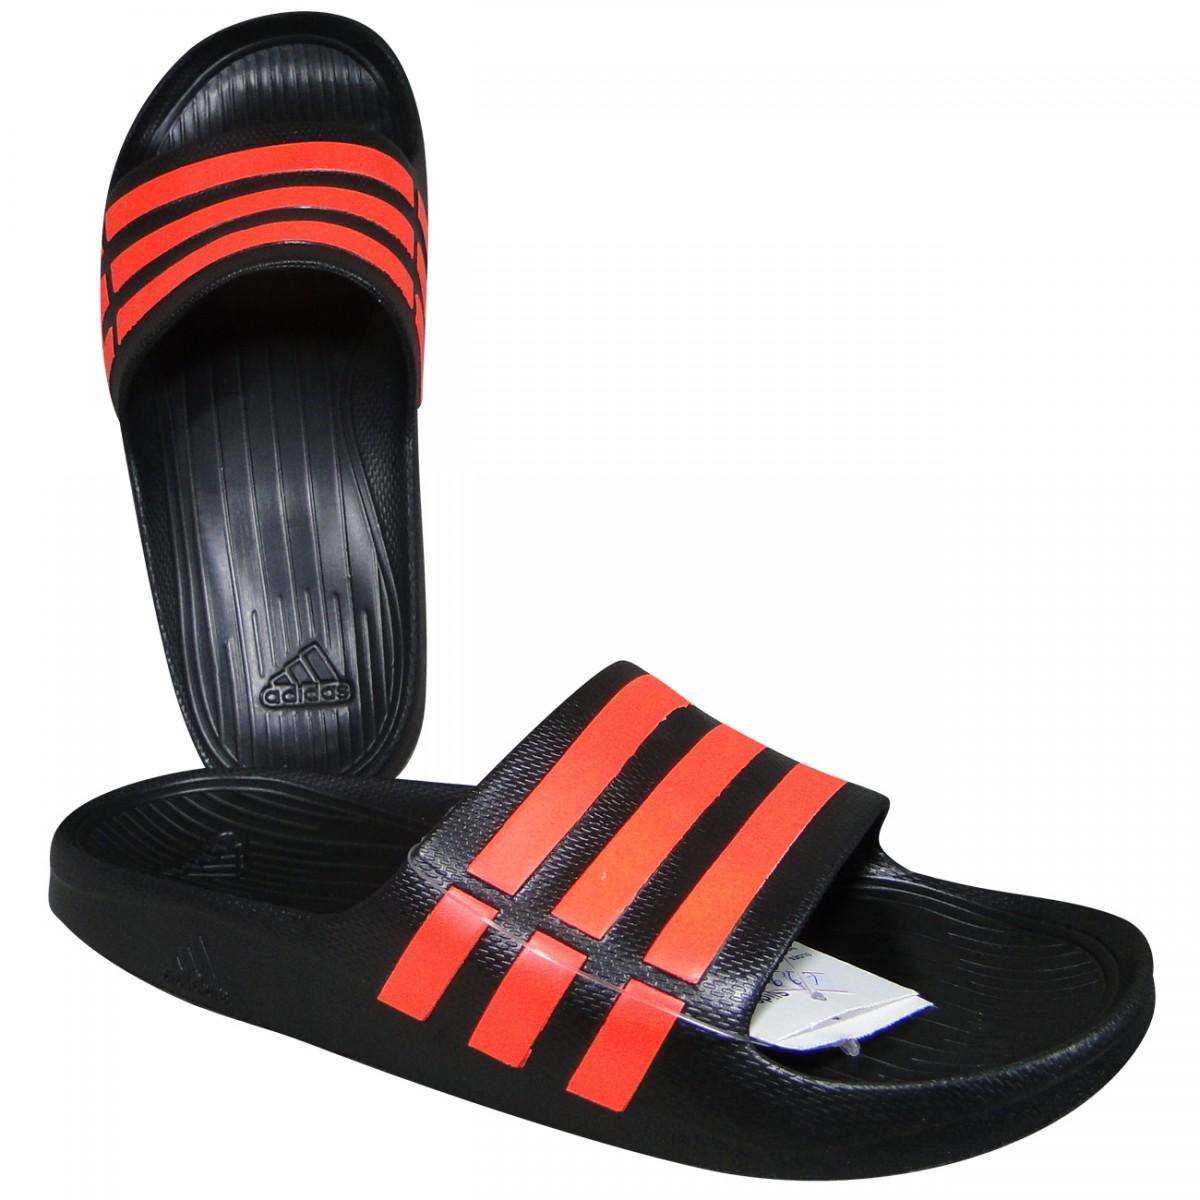 d13f4693a98fef Chinelo Adidas Duramo Slide